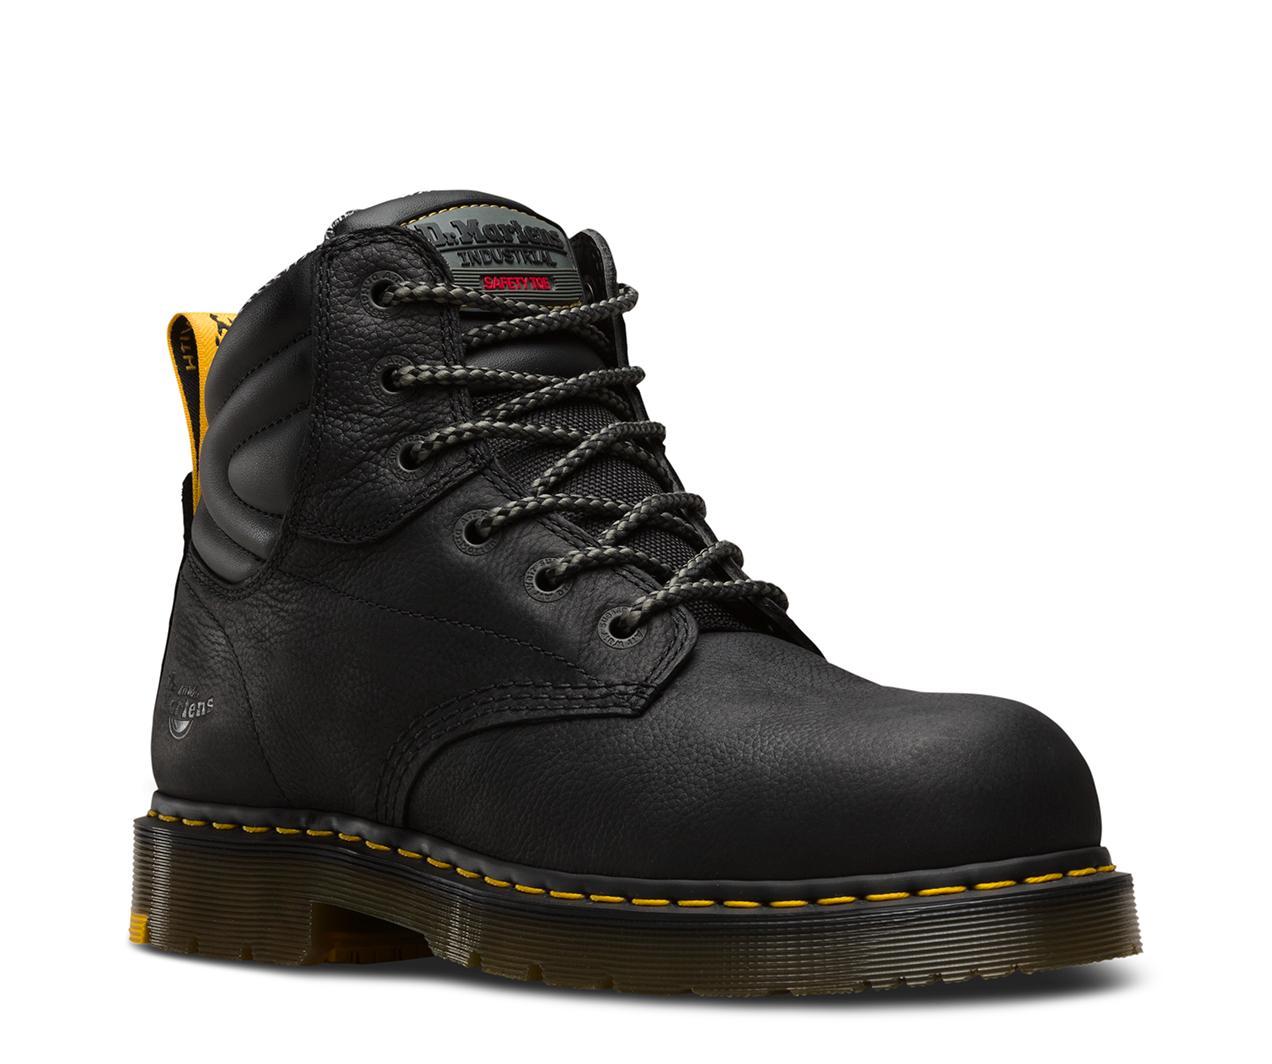 Martens Shoes Uk